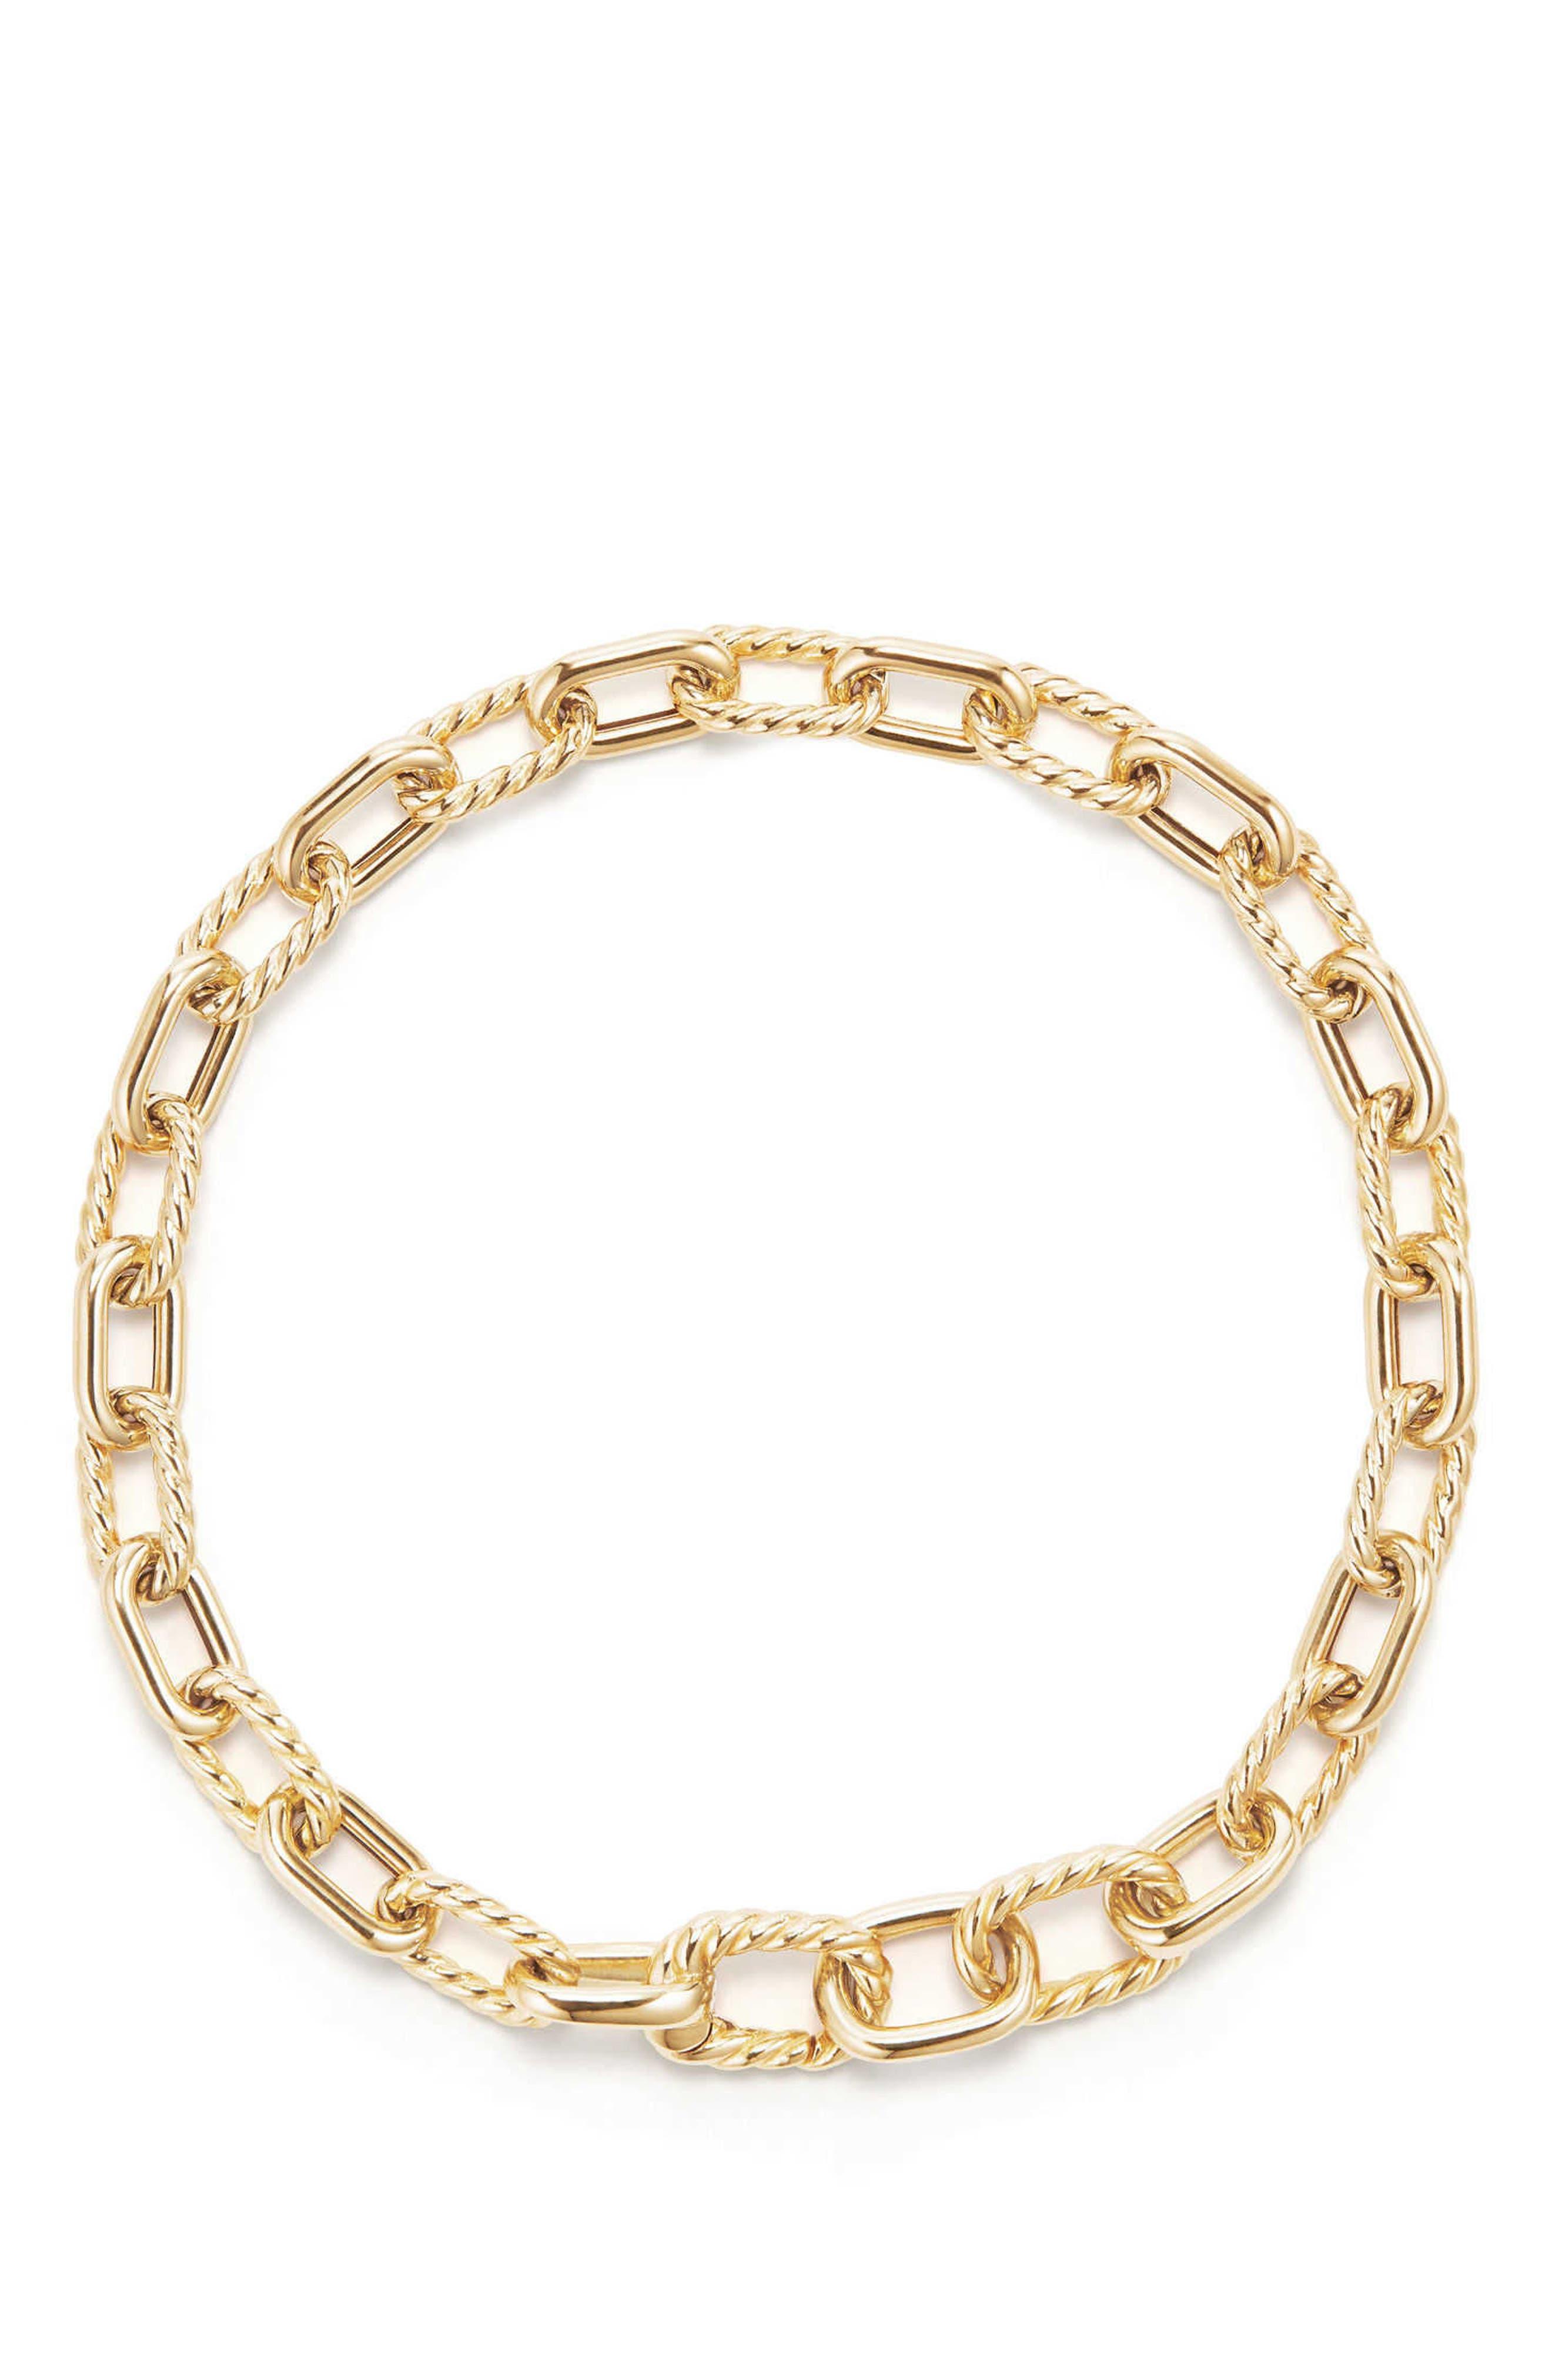 Main Image - David Yurman DY Madison Bold Chain Bracelet in 18K Gold